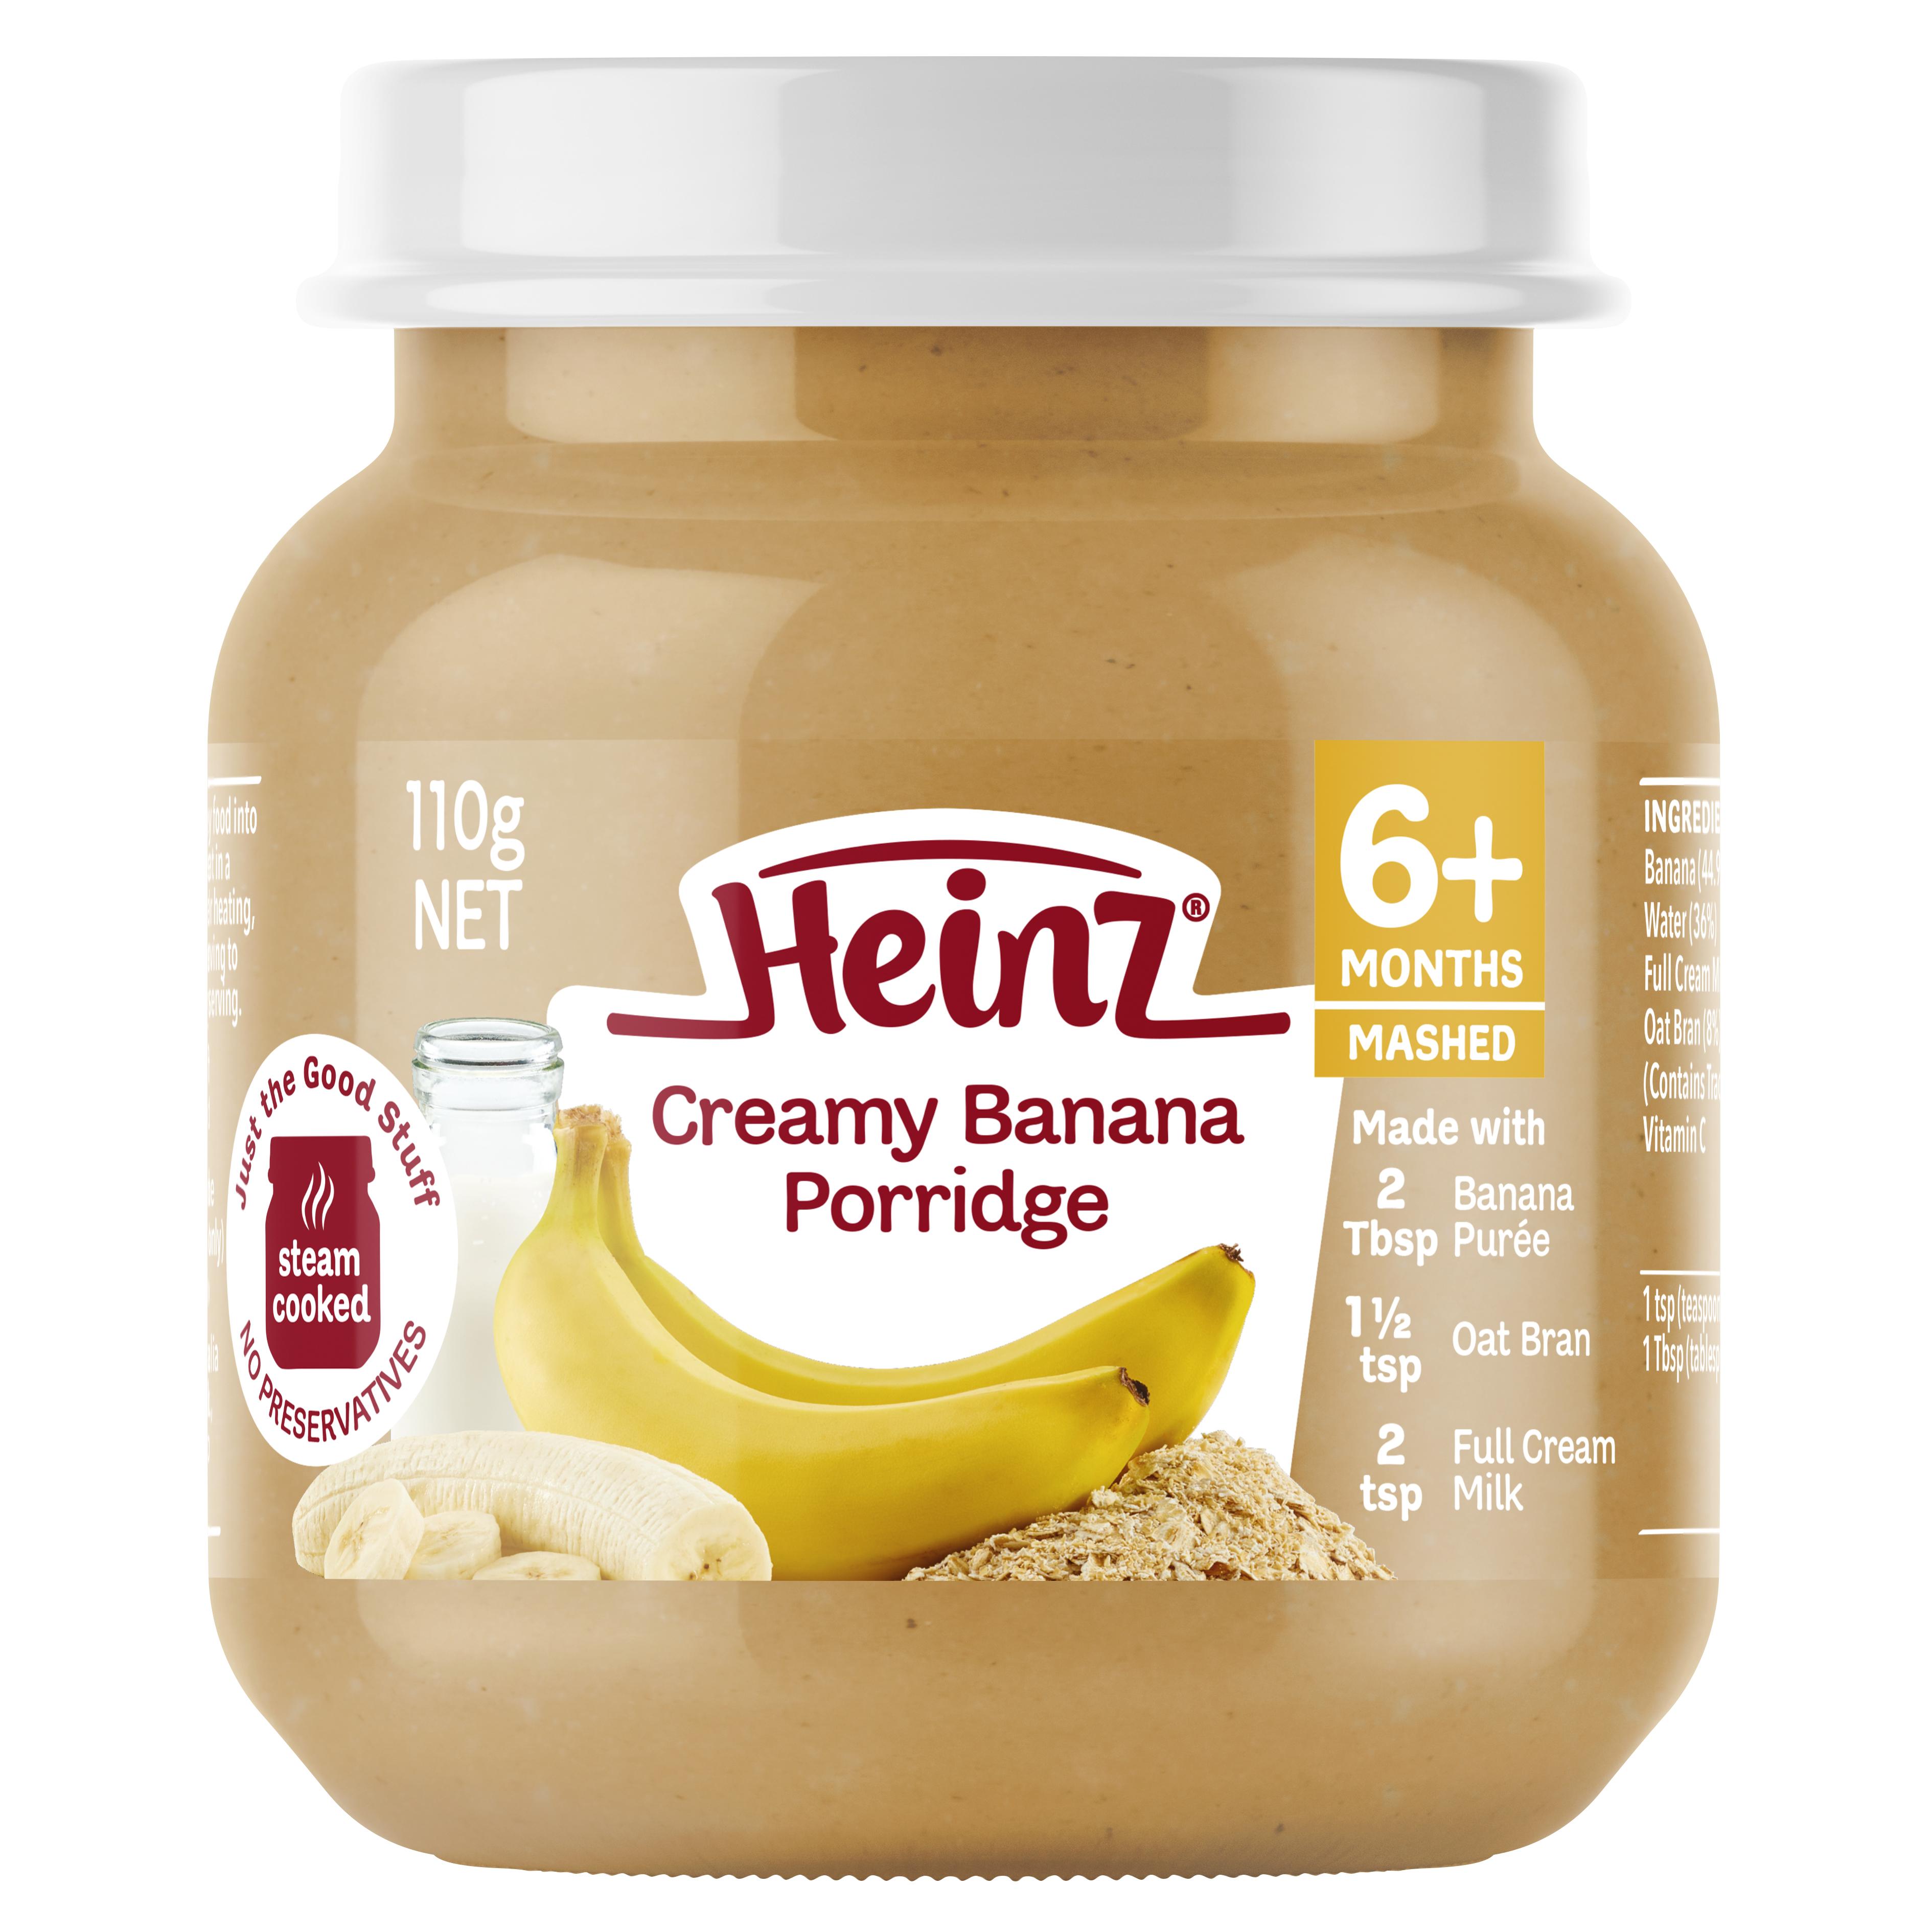 heinz-creamy-banana-porridge